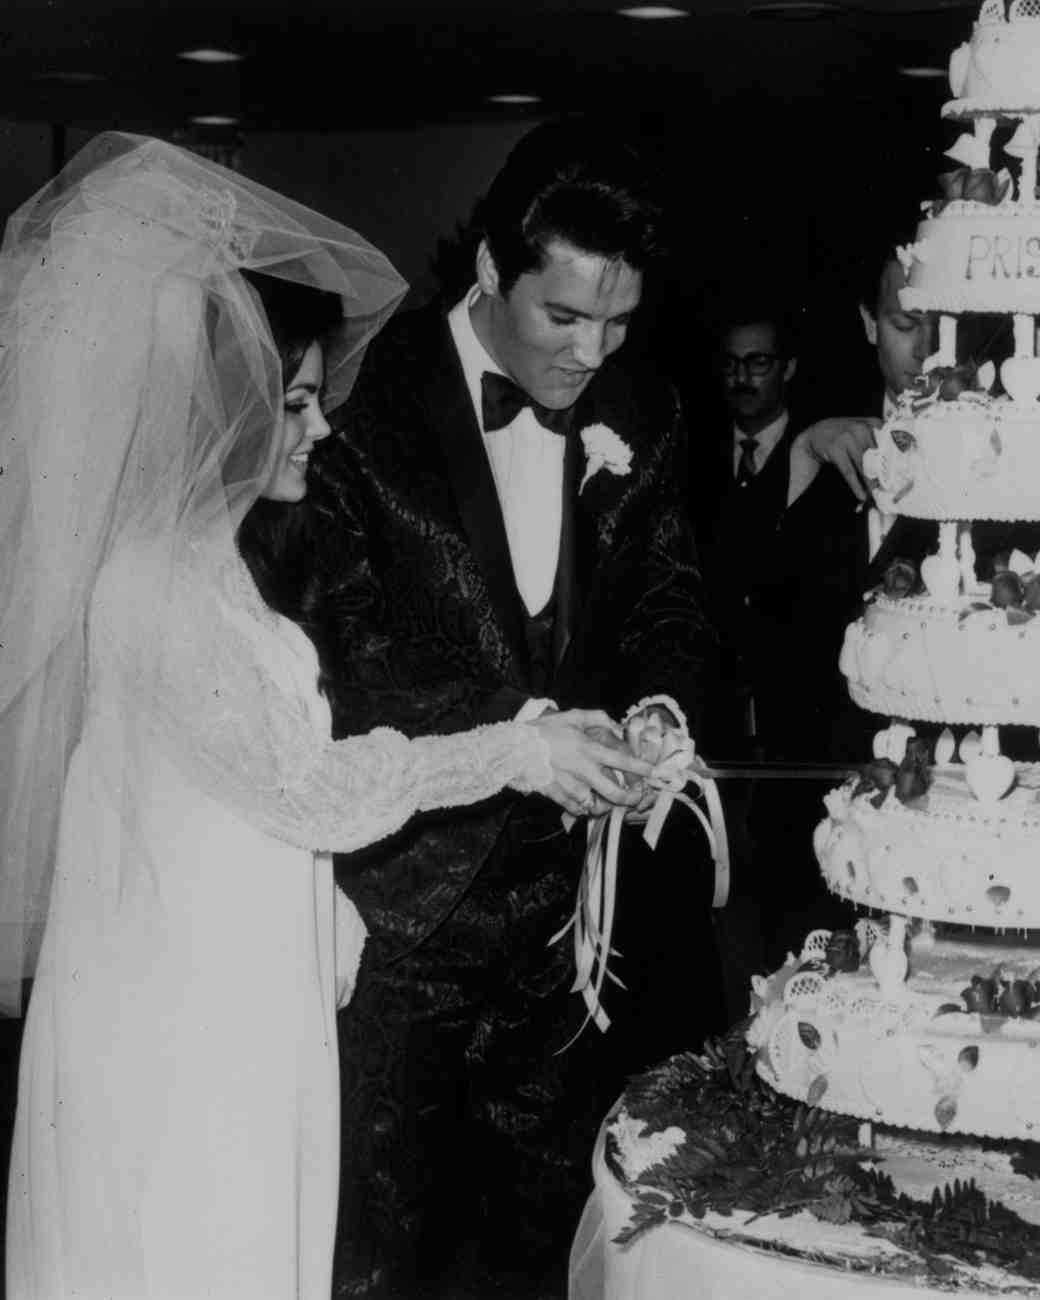 celebrity-brides-veils-priscilla-ann-beaulieu-elvis-presley-0615.jpg